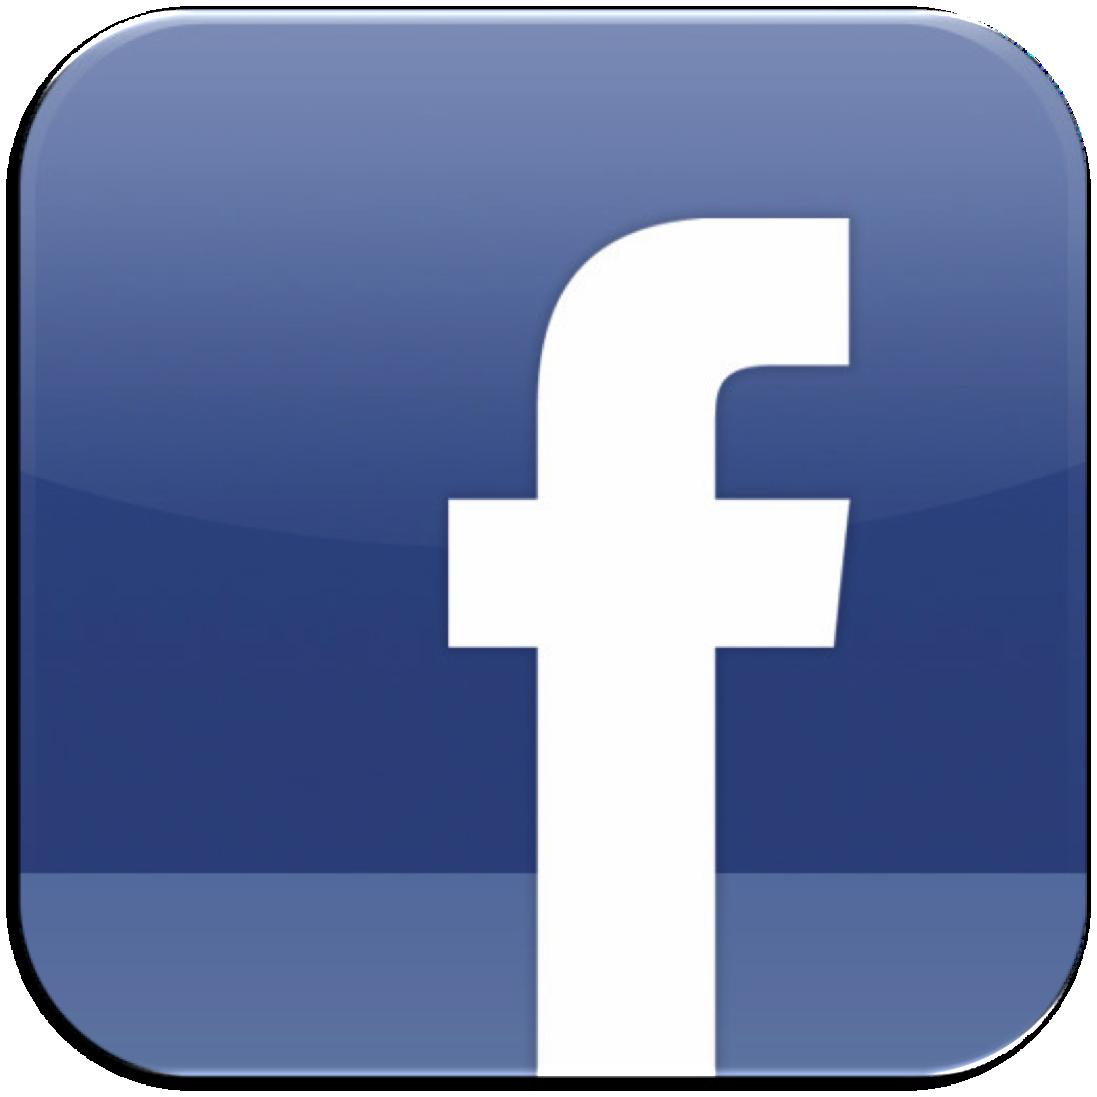 påmelding facebook